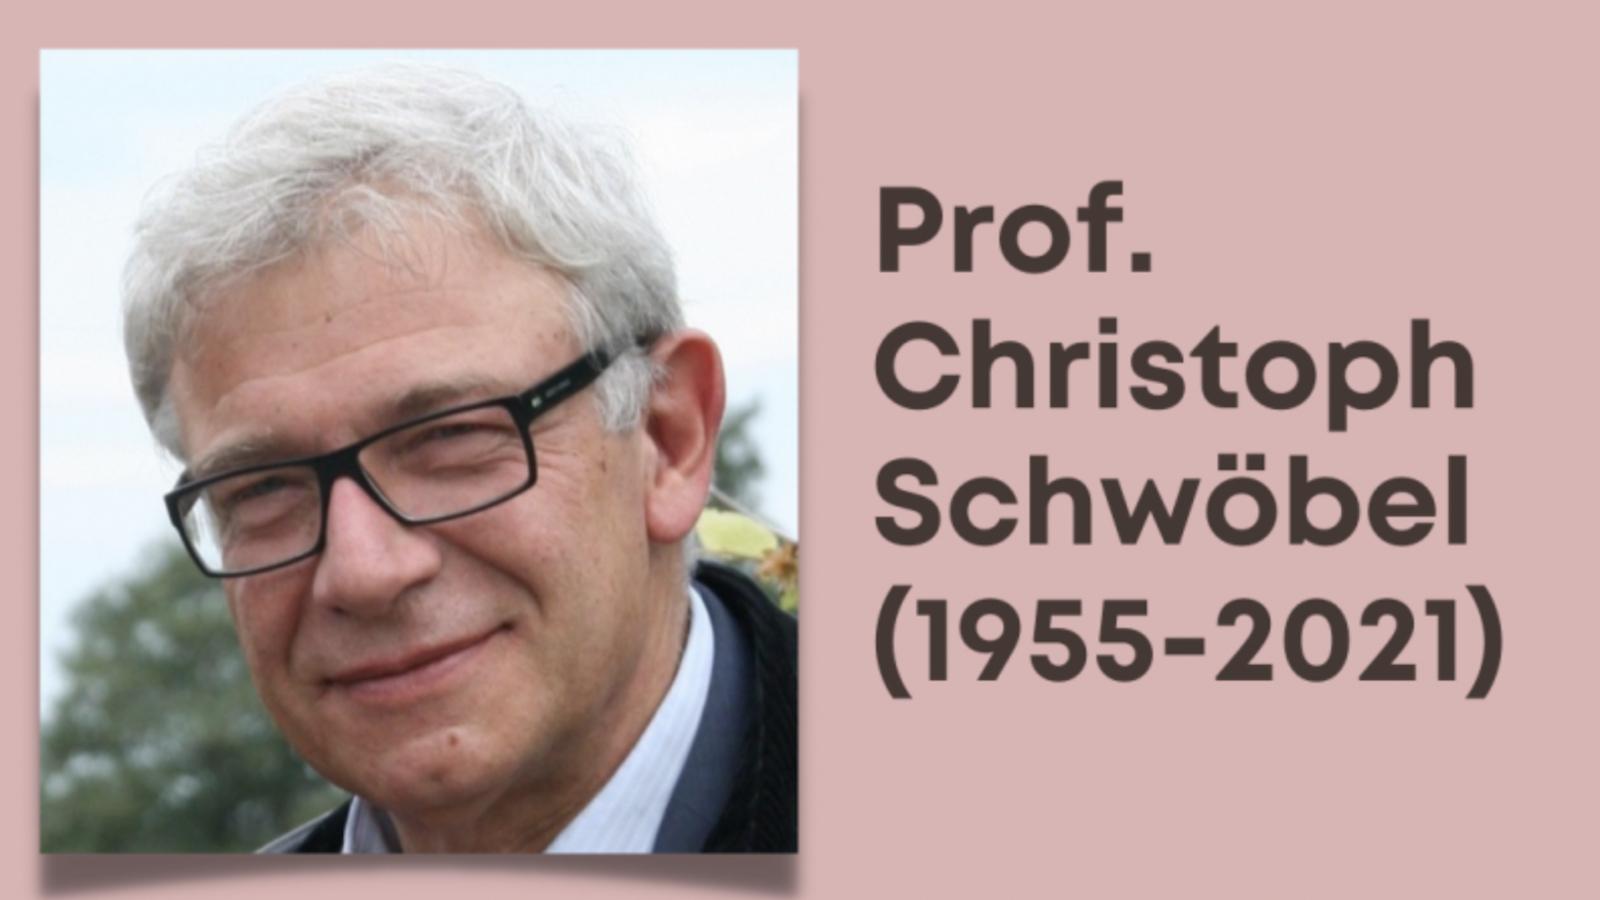 Remembering Christoph Schwöbel